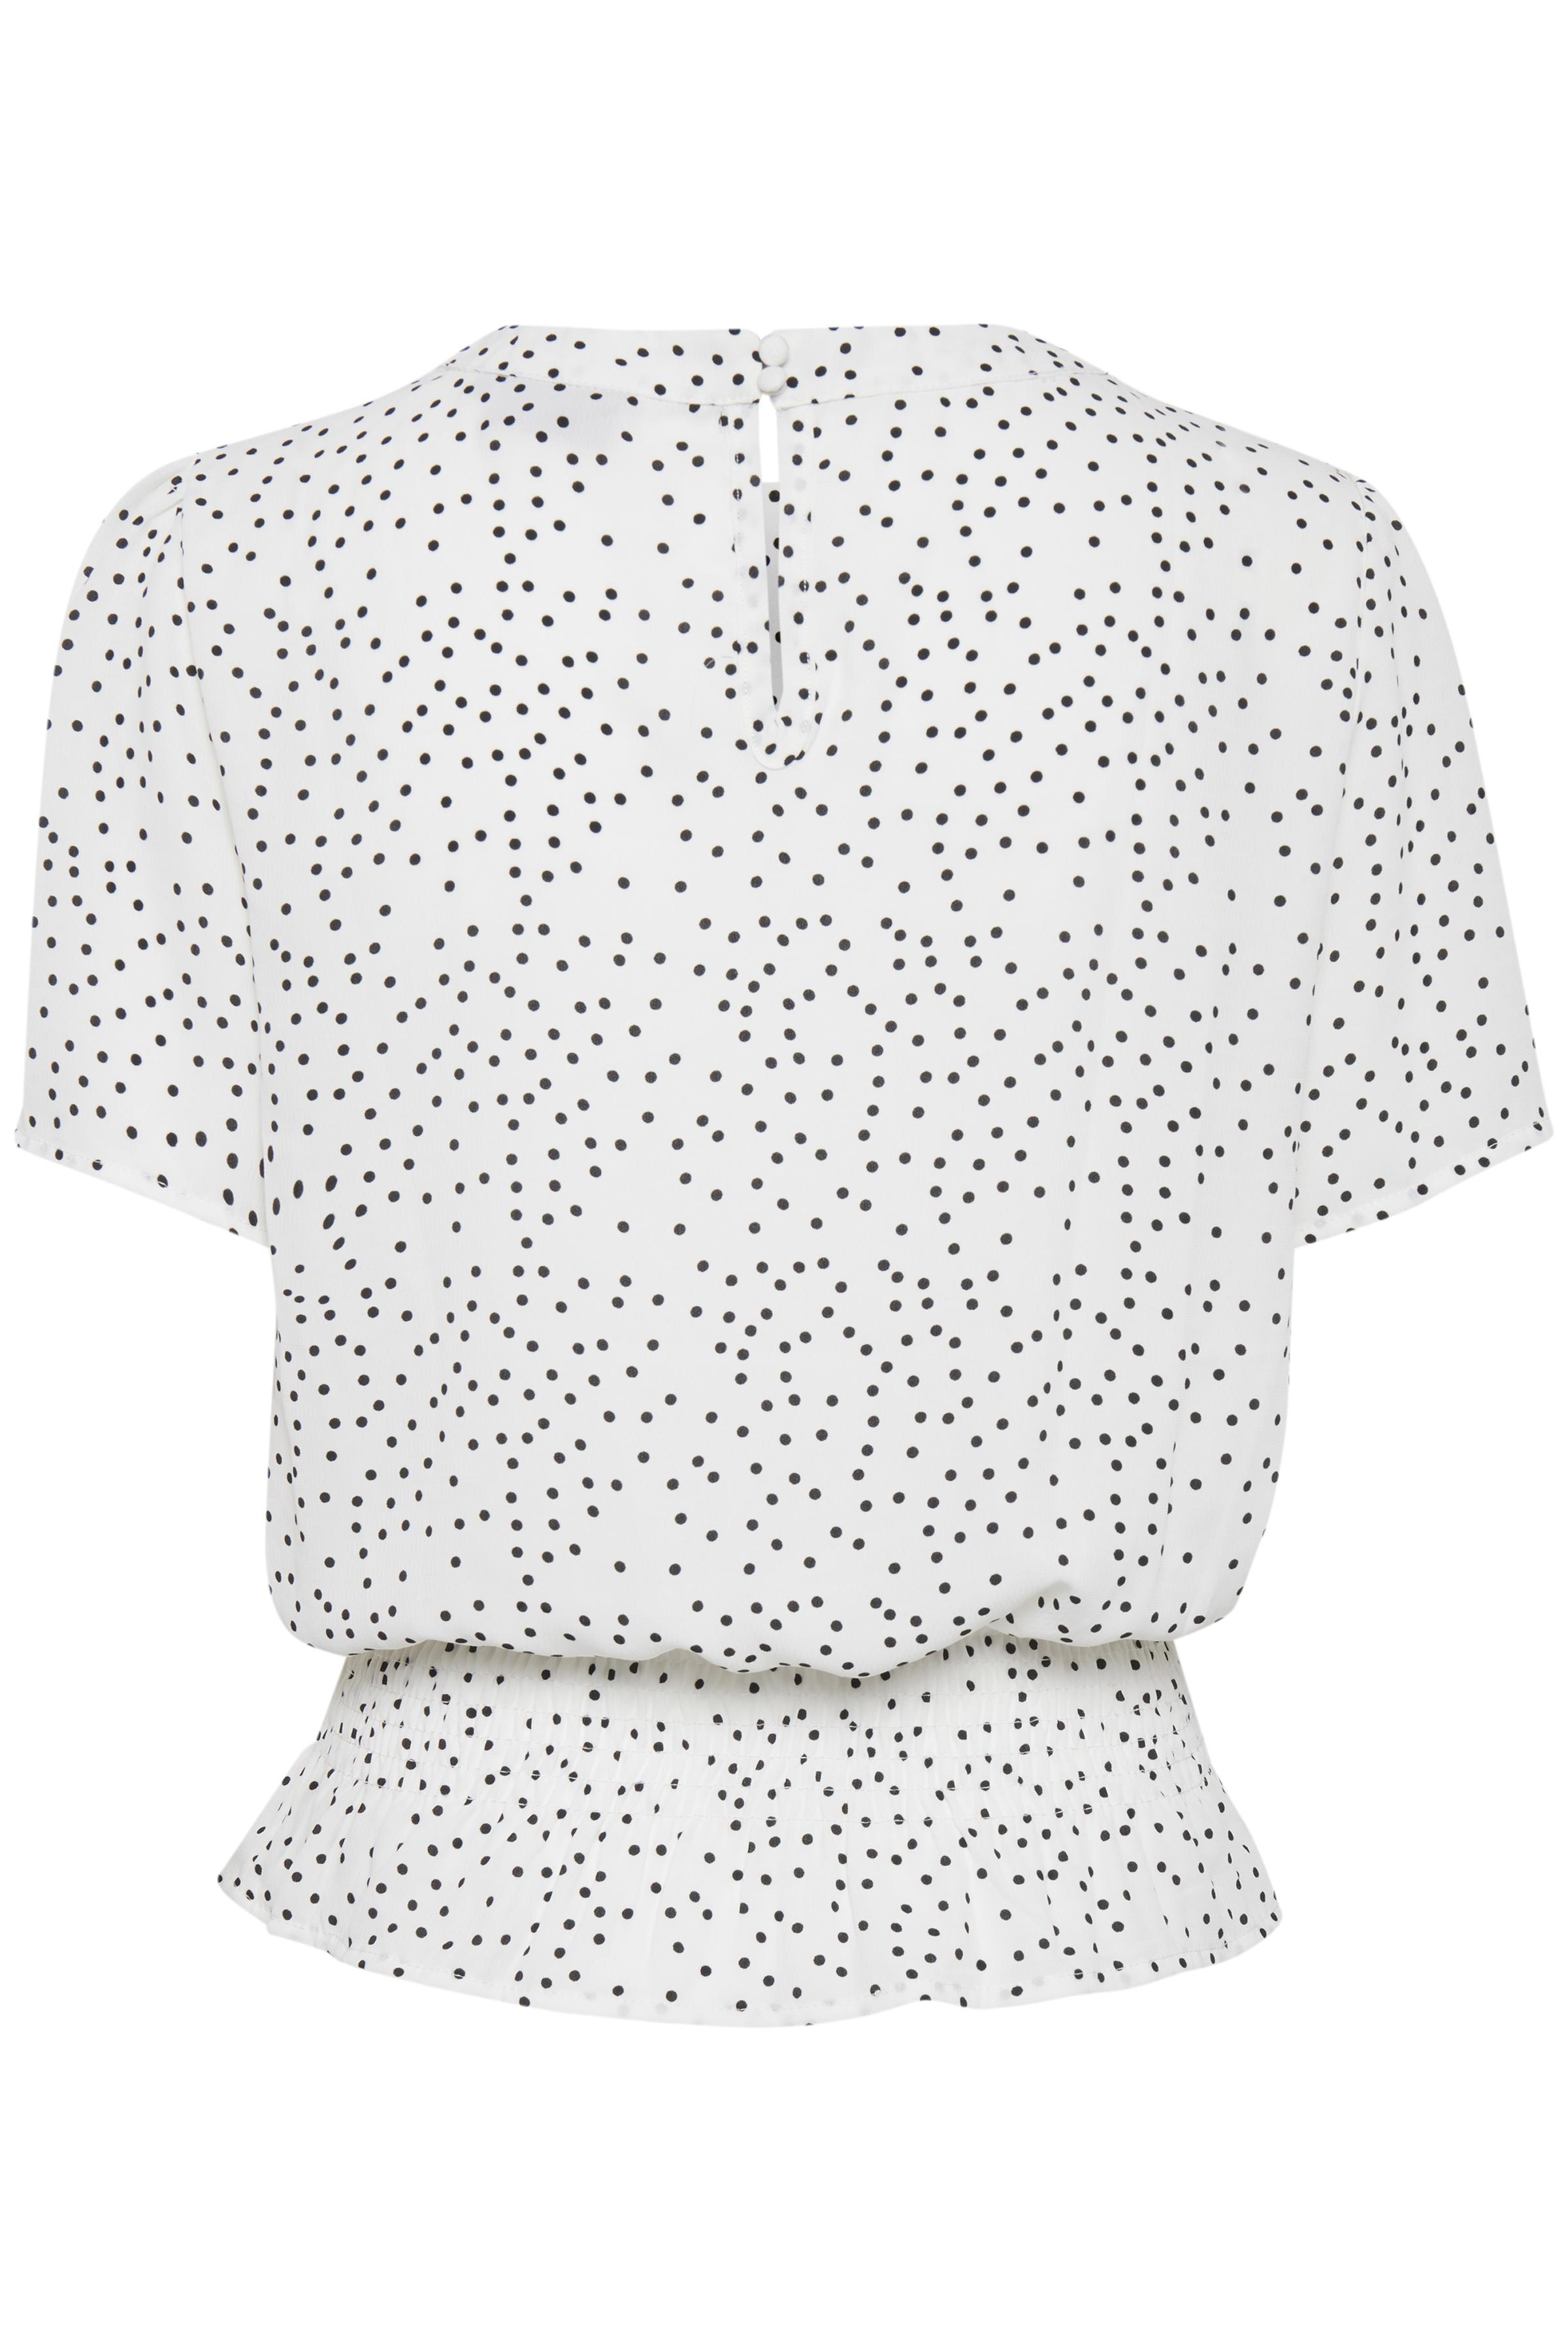 Off white combi 1 Top fra b.young – Køb Off white combi 1 Top fra str. 34-42 her